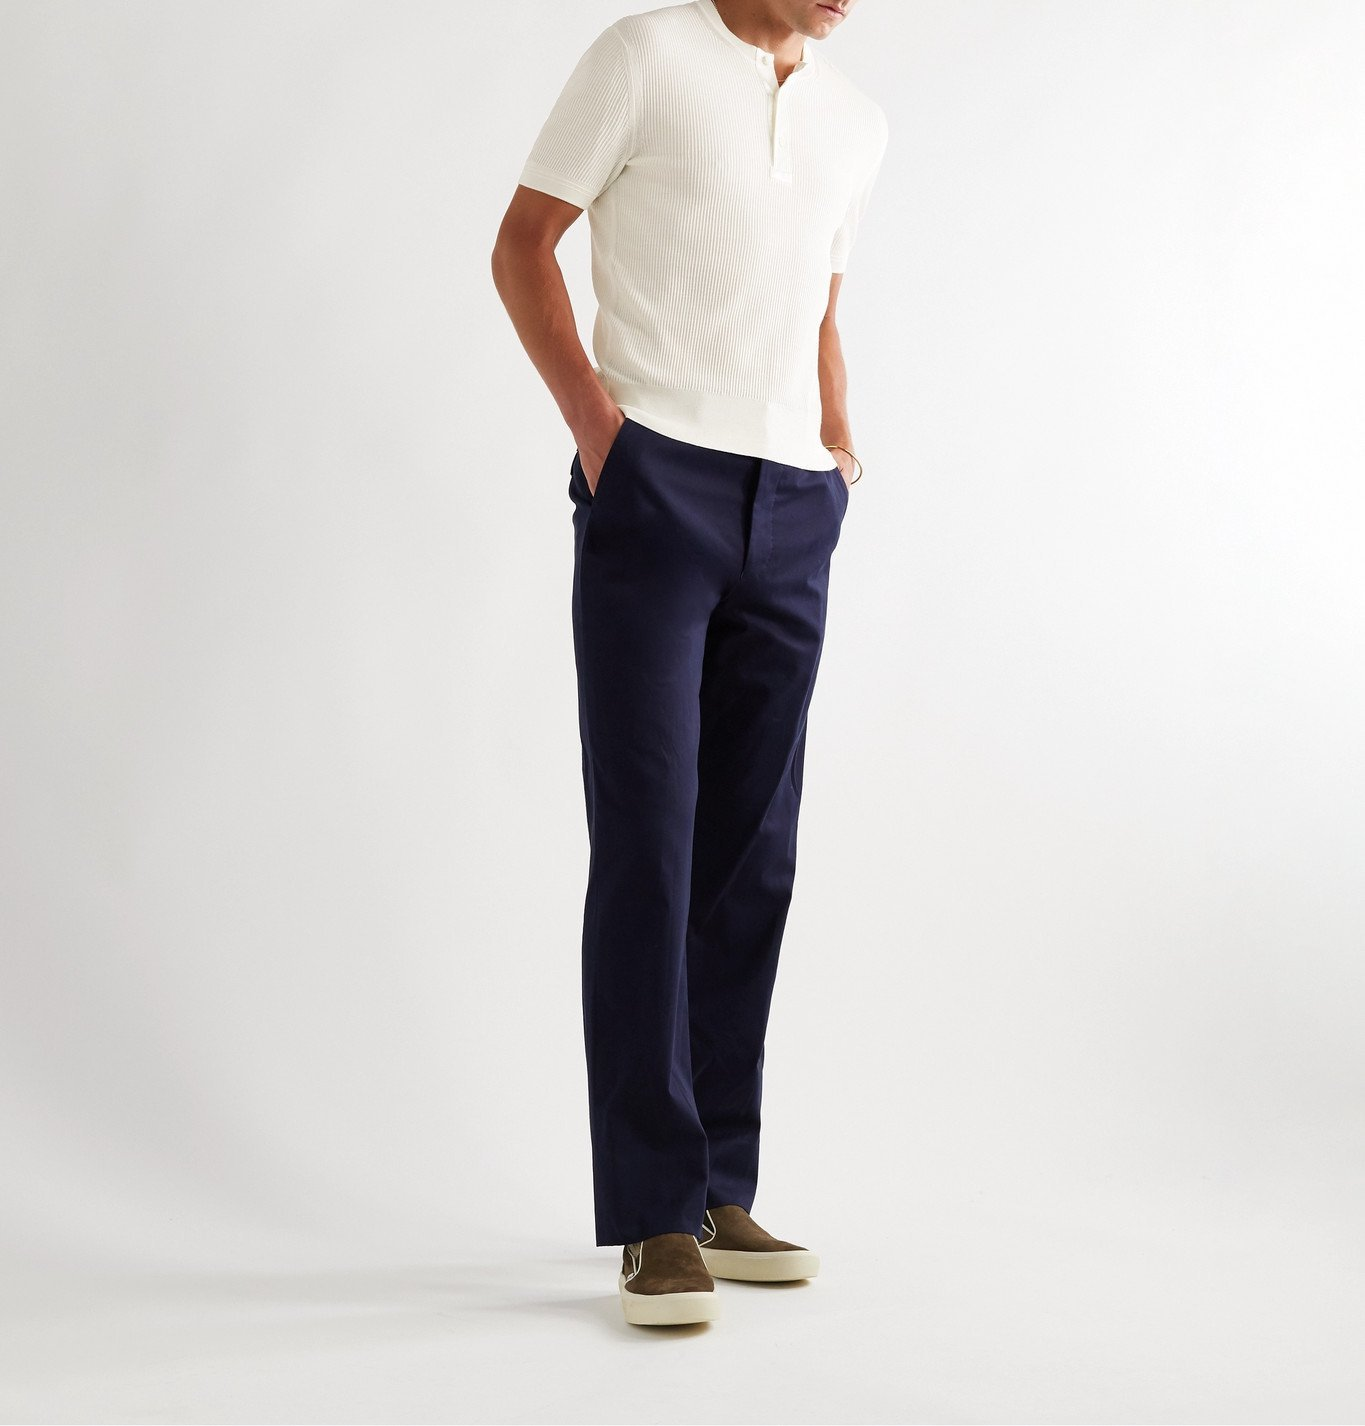 TOM FORD - Satin-Trimmed Ribbed Silk Henley T-Shirt - White